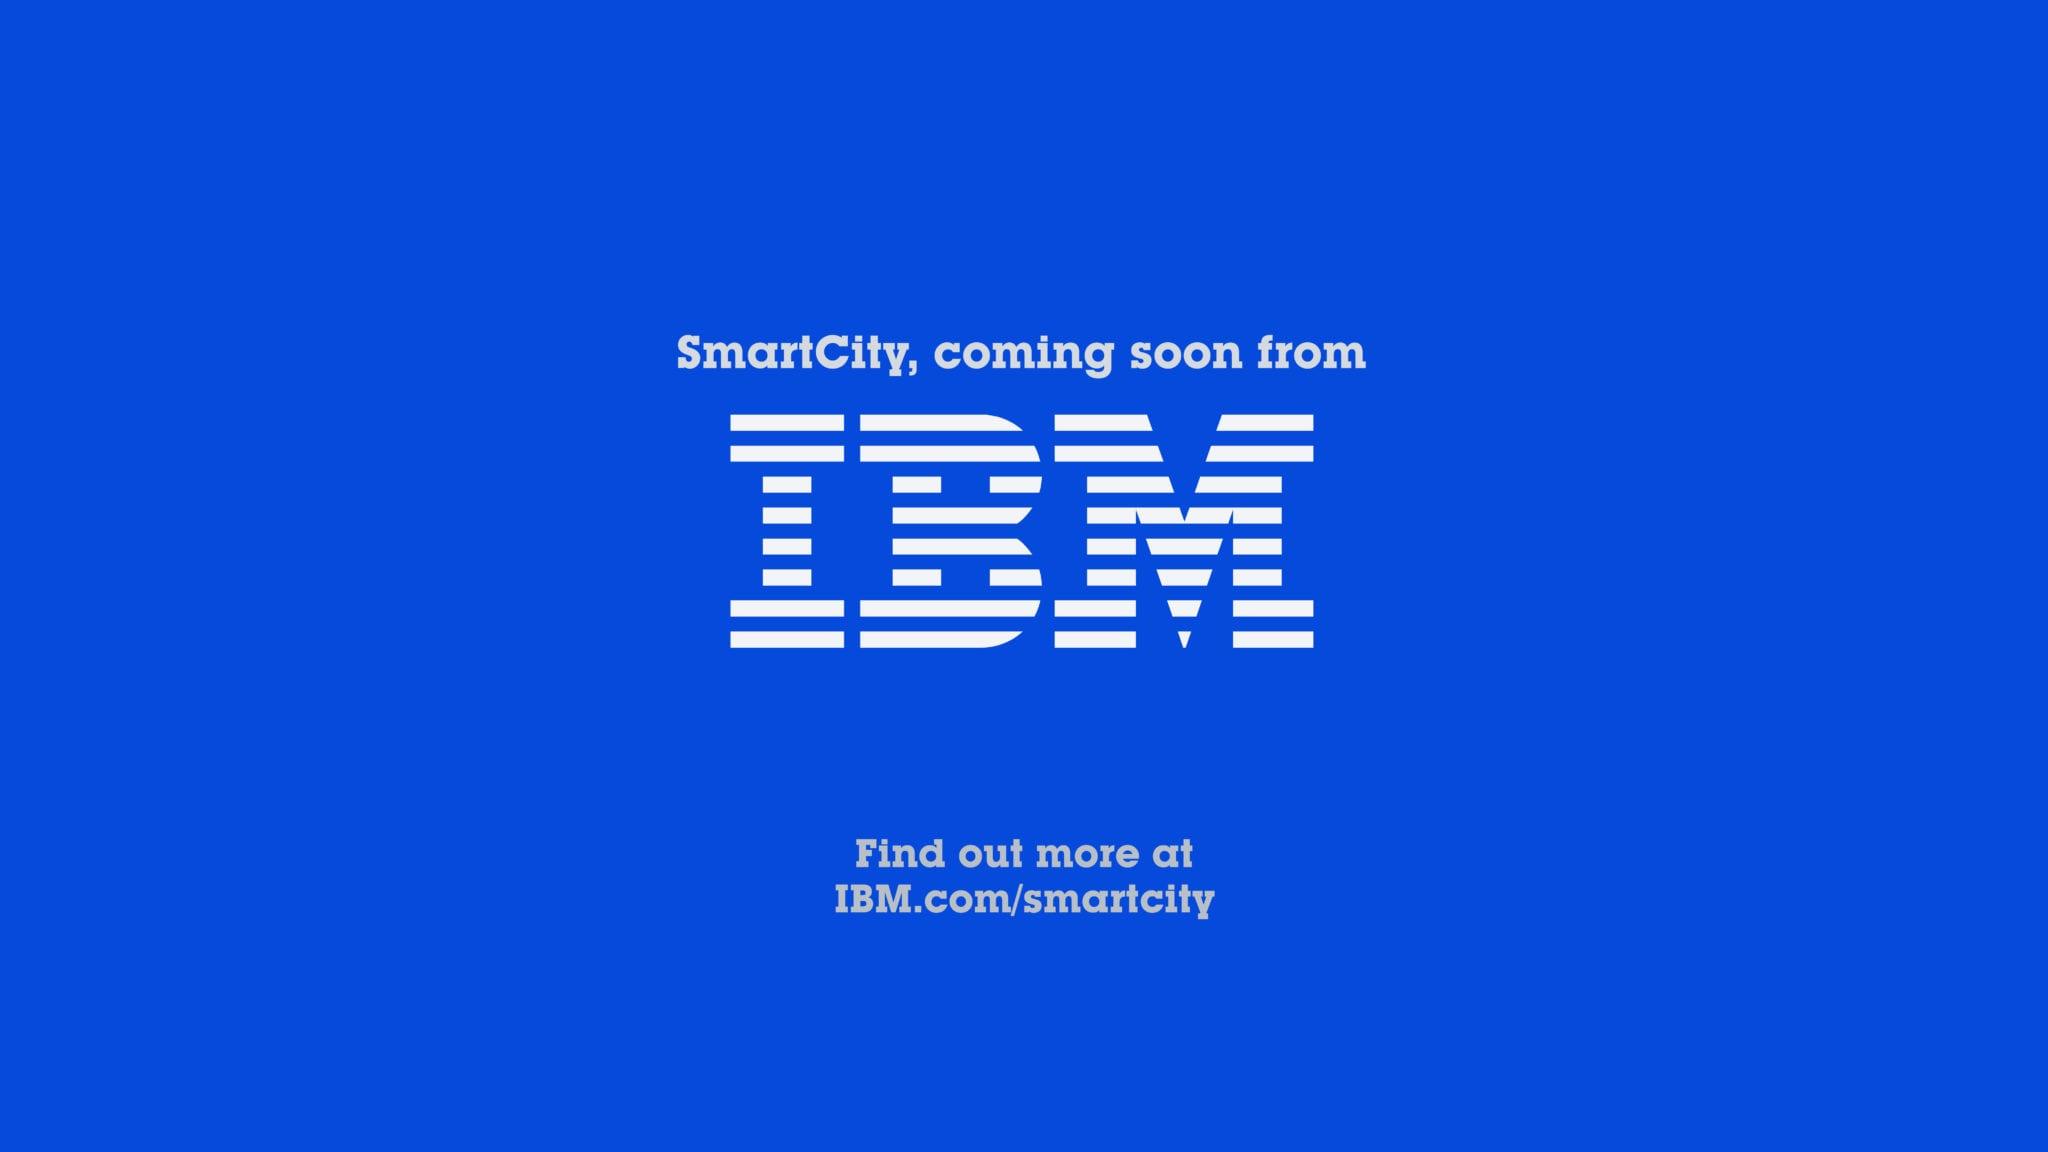 IBM-02-22